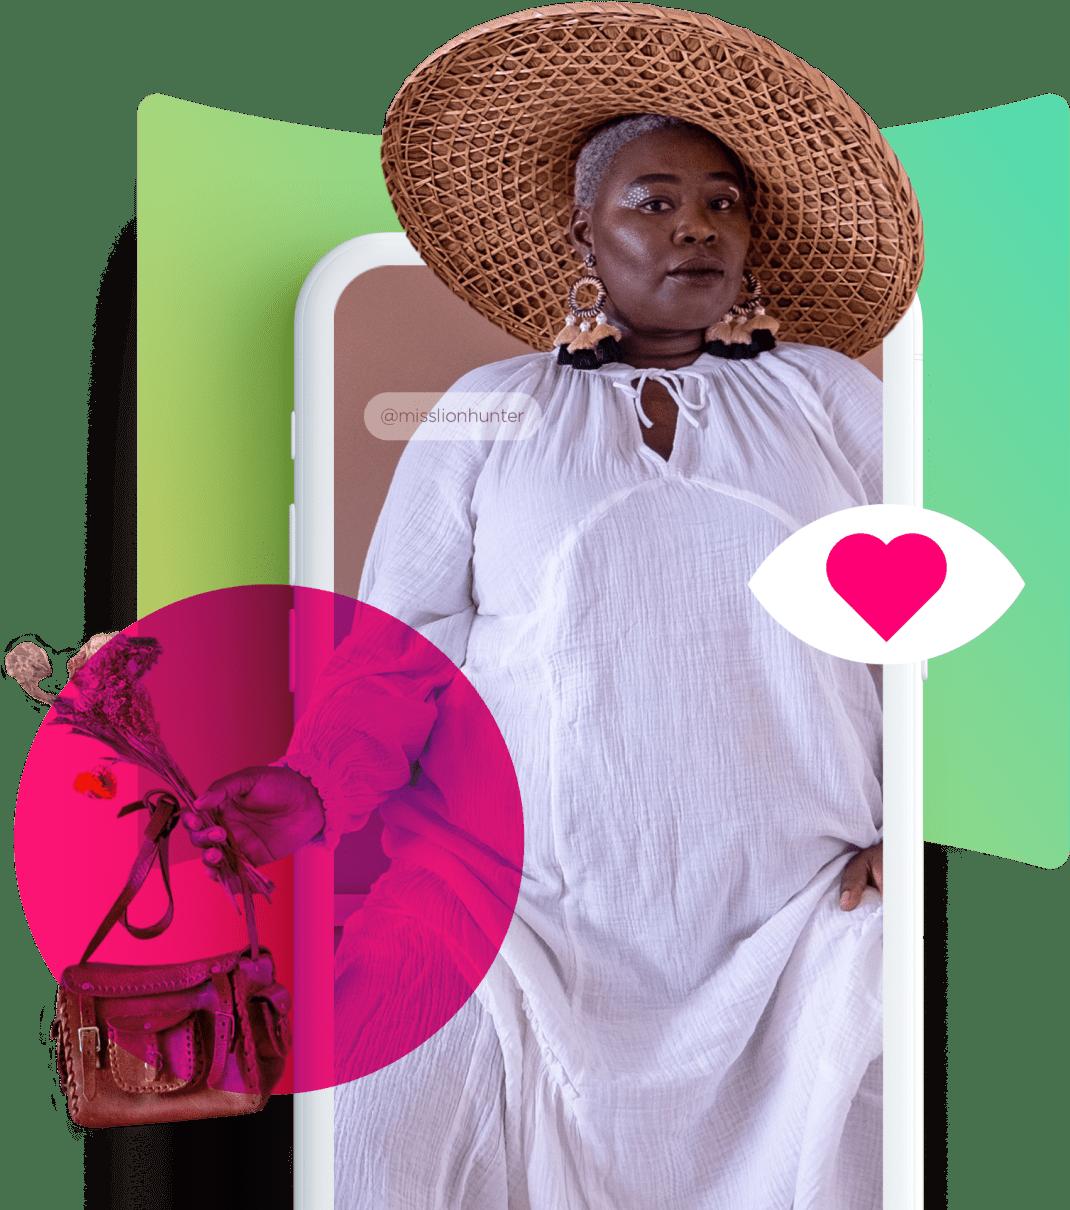 woman izea hat purse heart misslionhunter